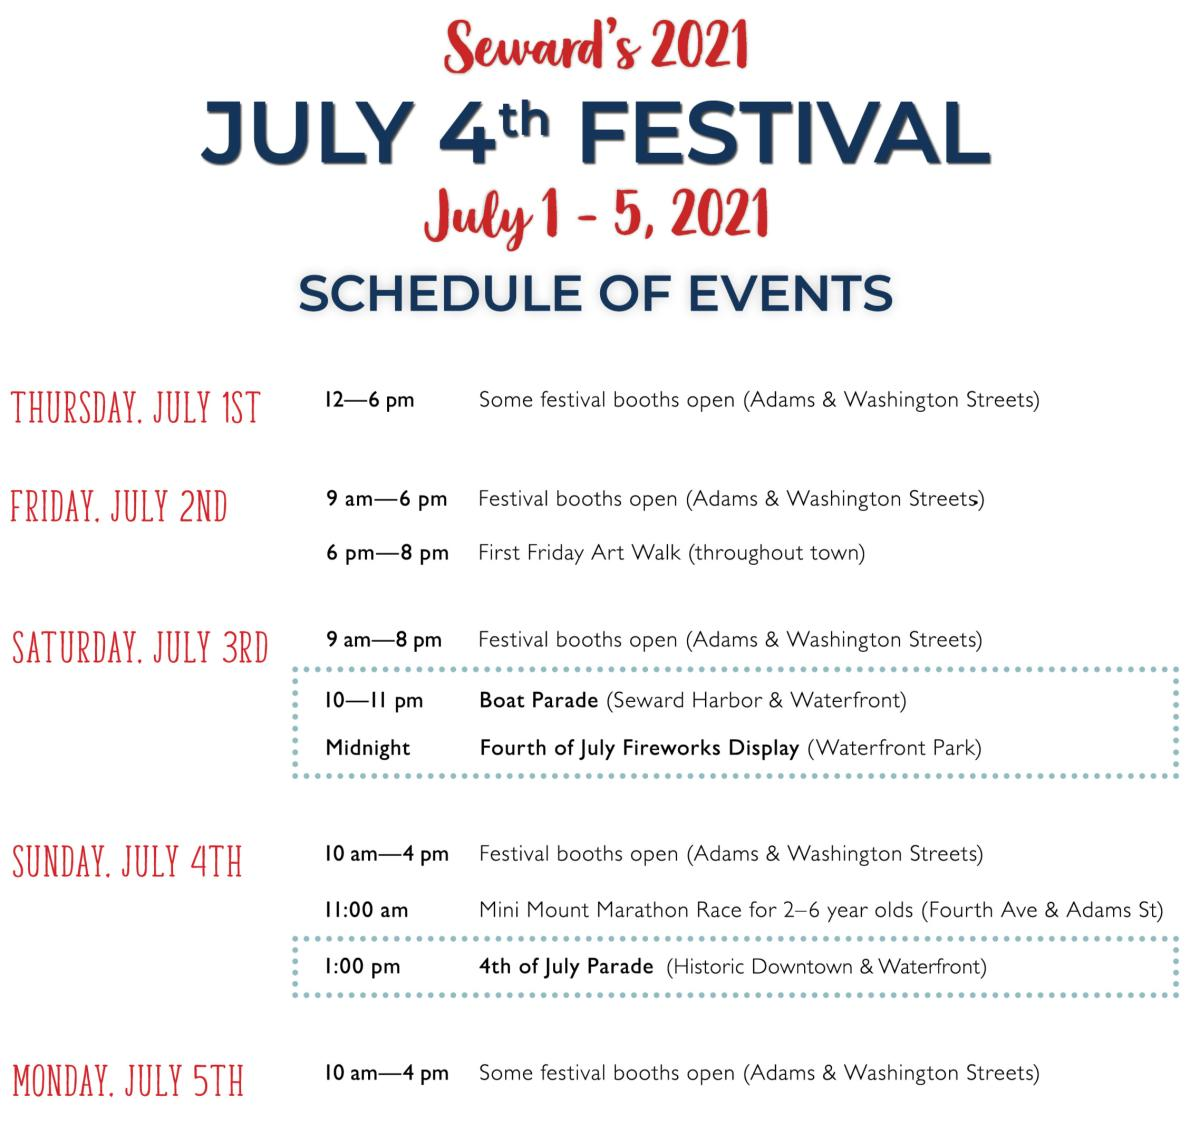 July 4th Schedule